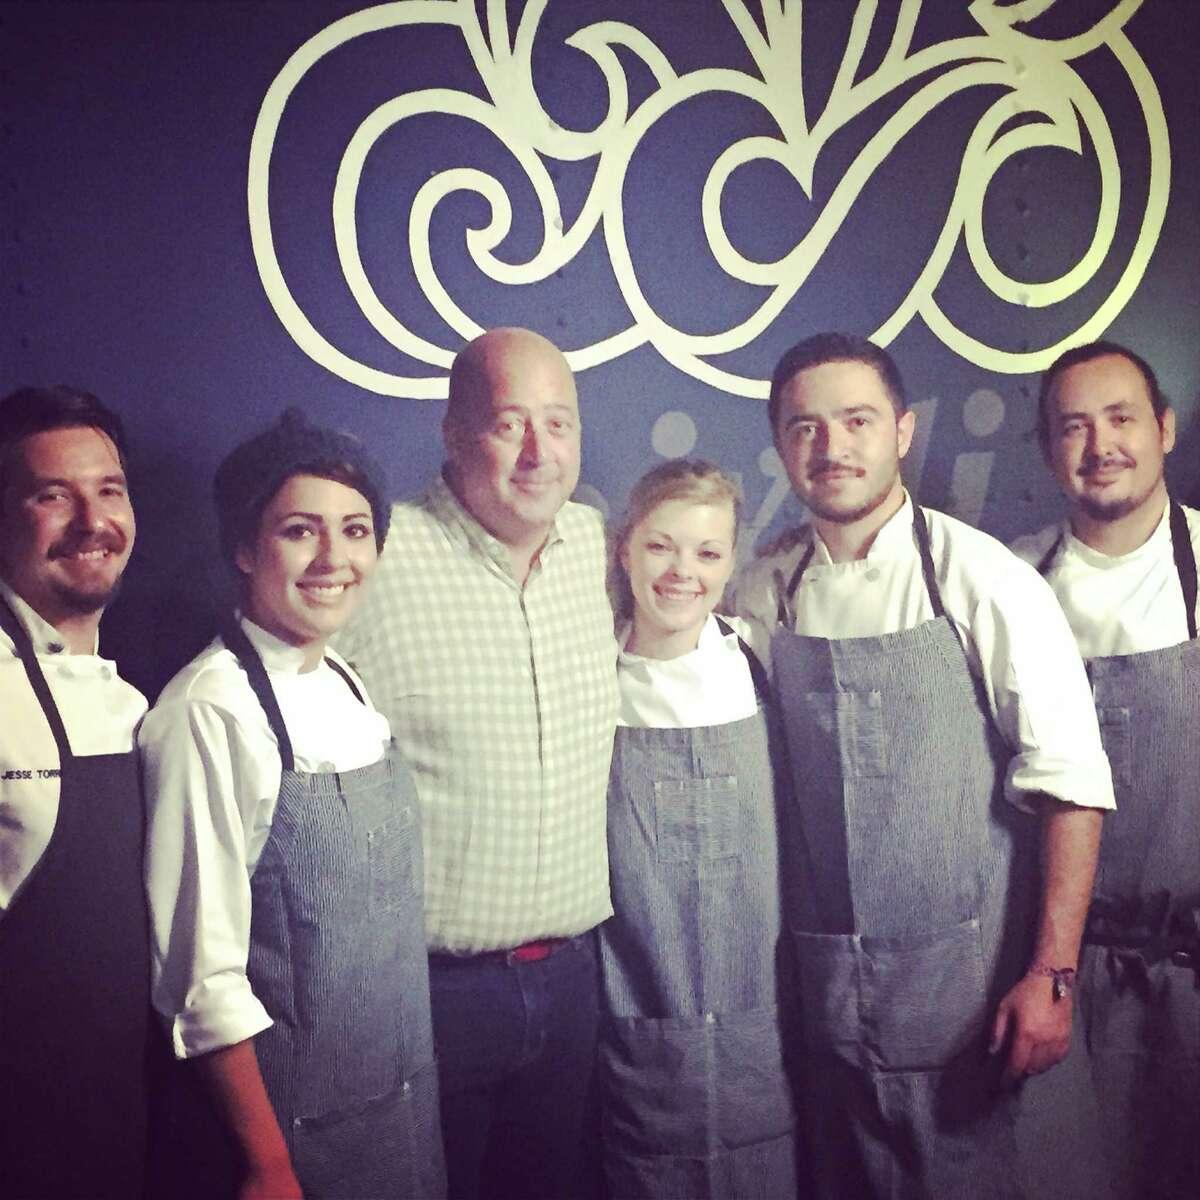 From left: Jesse Torres, Dennise Montano, Andrew Zimmern, Cassie Ramsey, Diego Galicia, Rico Torres